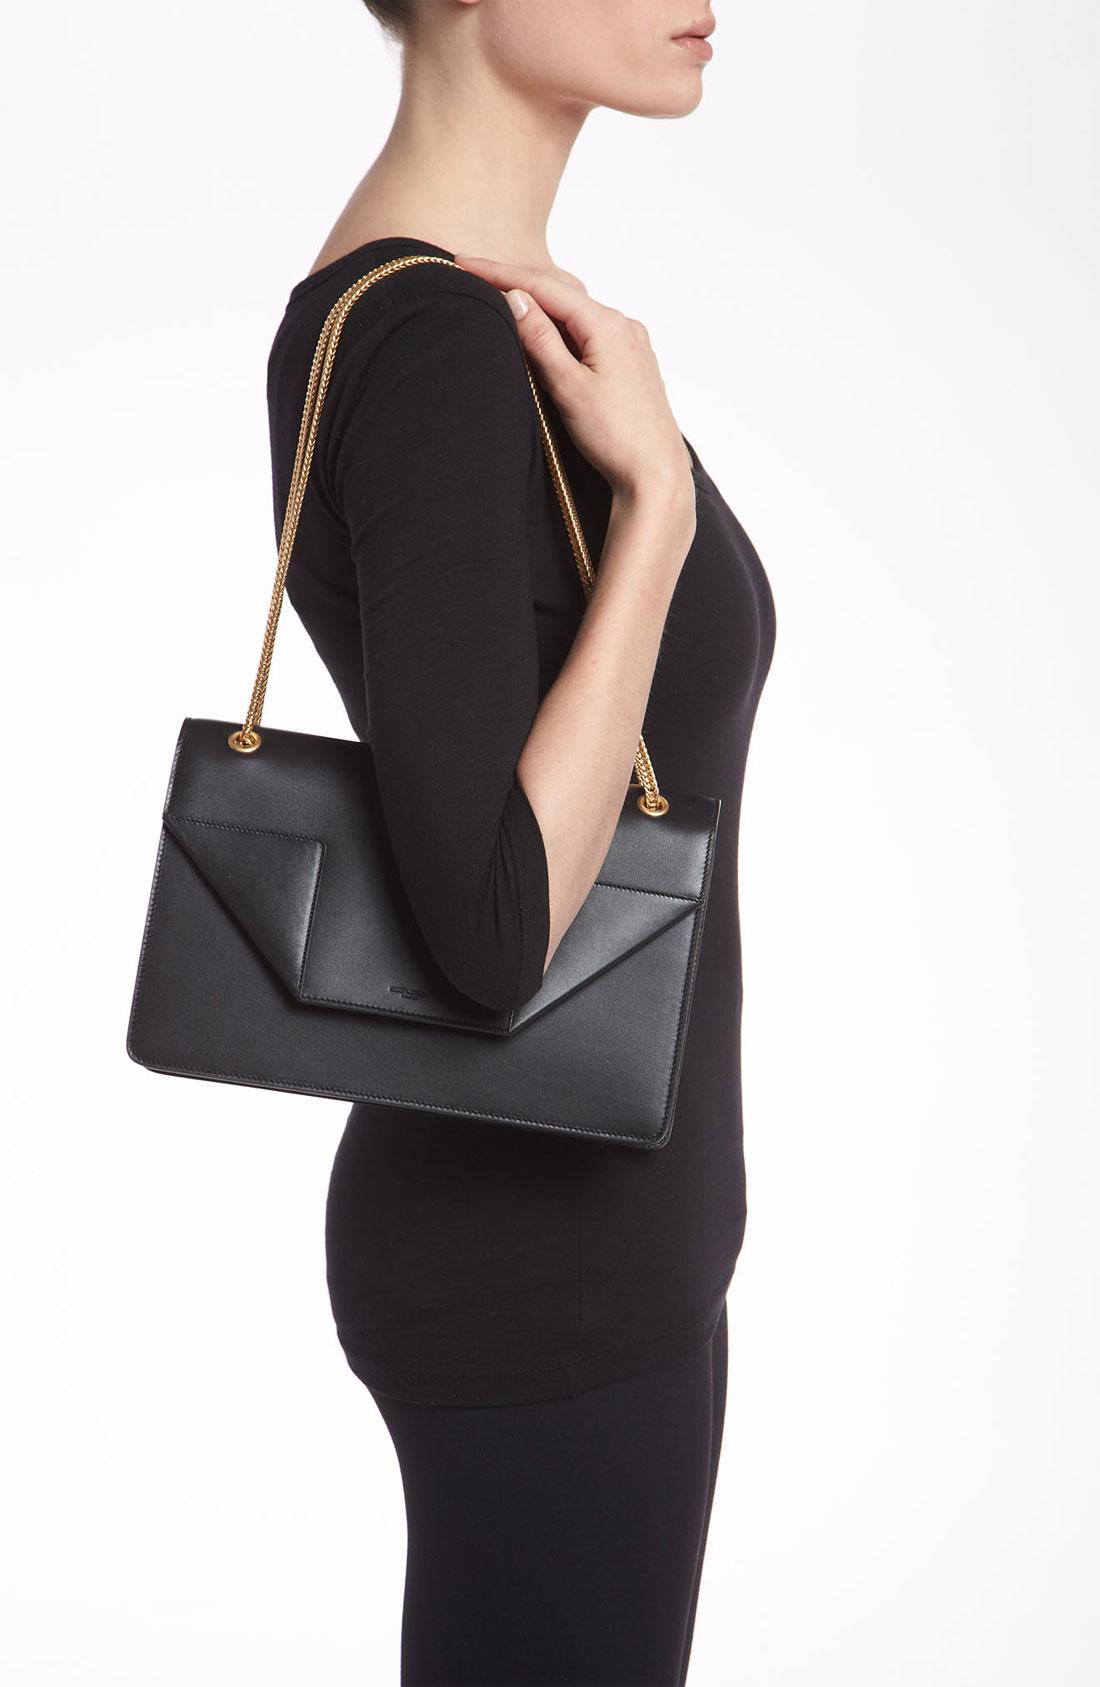 Saint laurent Betty Medium Leather Shoulder Bag in Black | Lyst